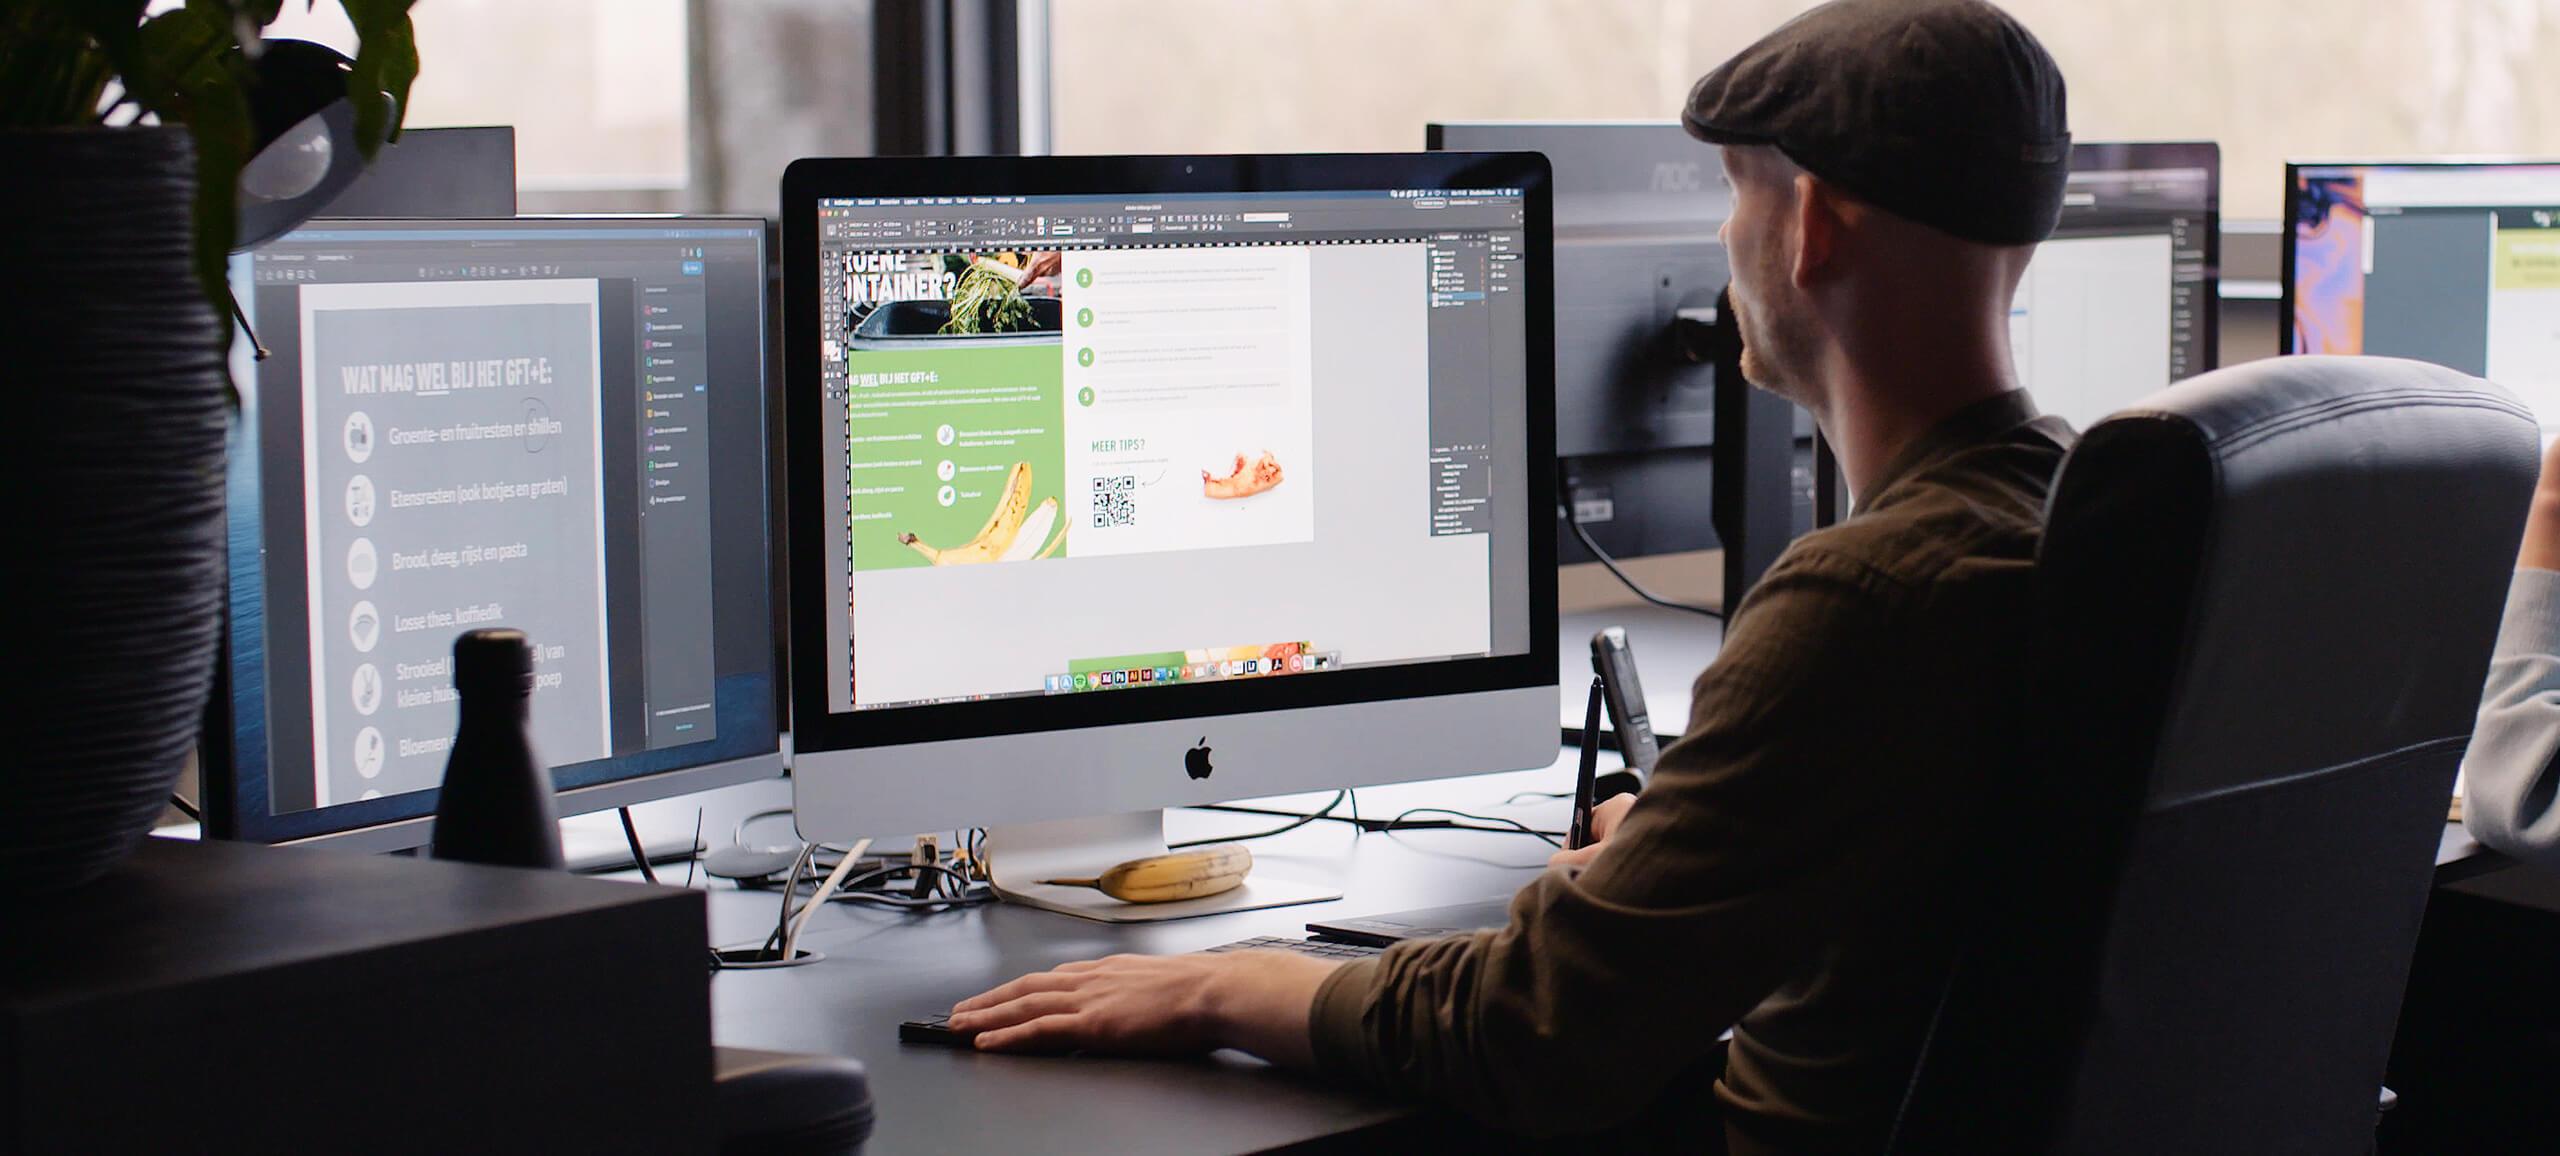 Merkpositionering Every Day creactive digital agency